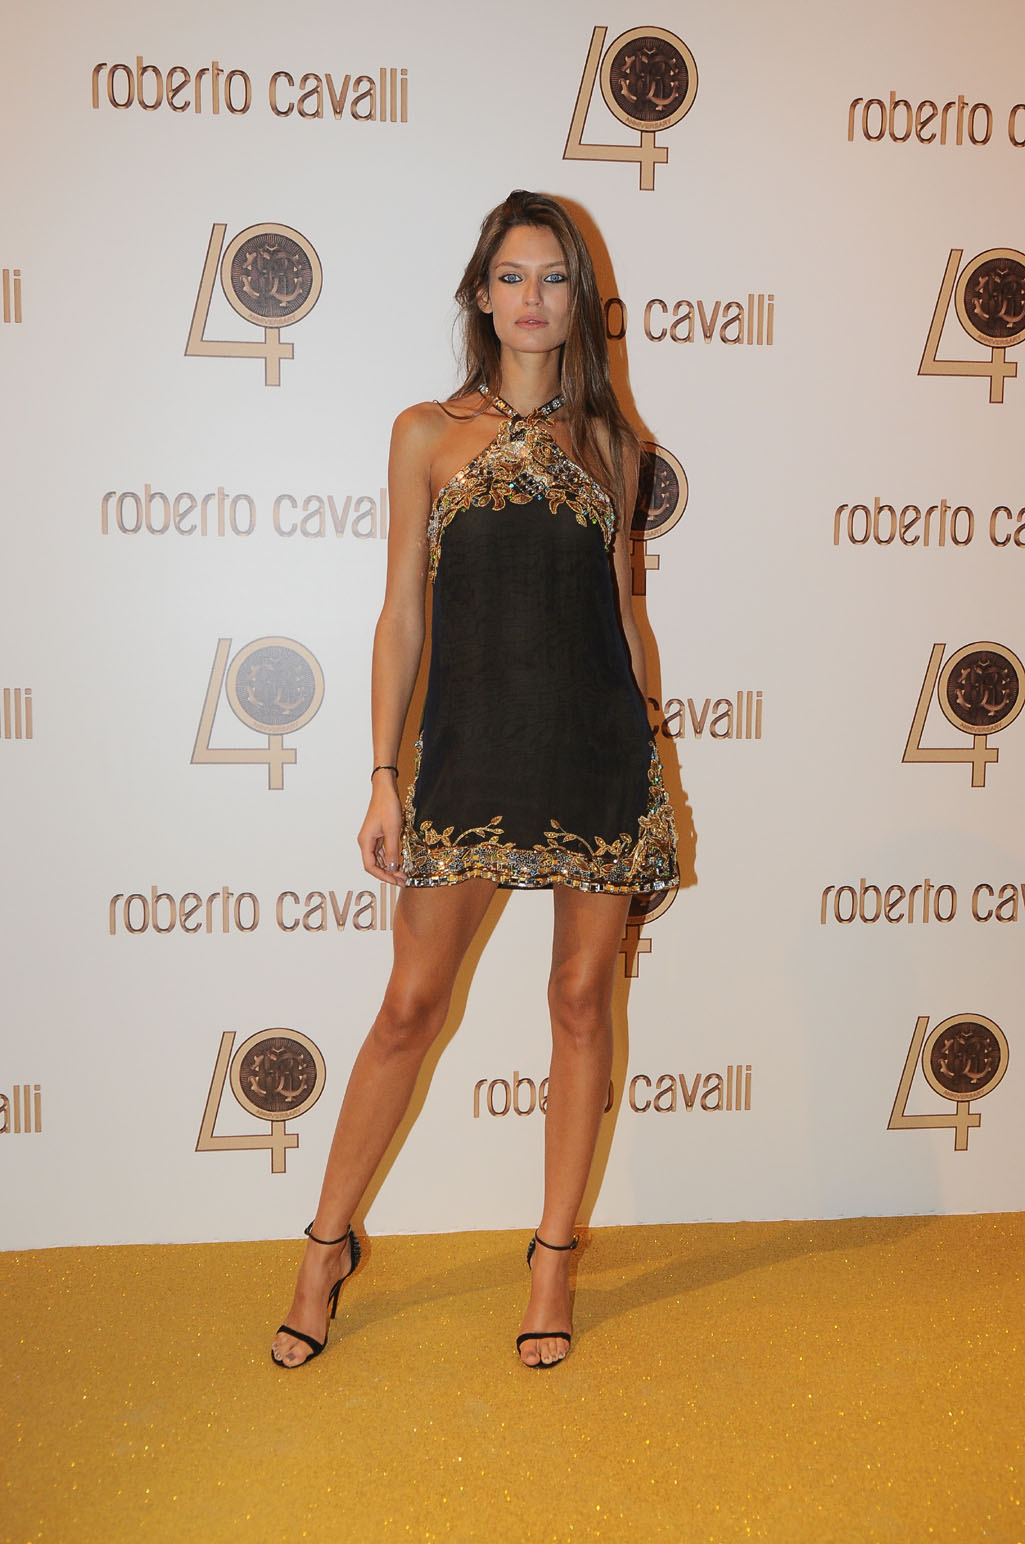 http://2.bp.blogspot.com/_2ZHypClFztM/TKrGDYyQEdI/AAAAAAAAAjk/GmmplLJiifc/s1600/Bianca+Balti+in+Roberto+Cavalli.jpg